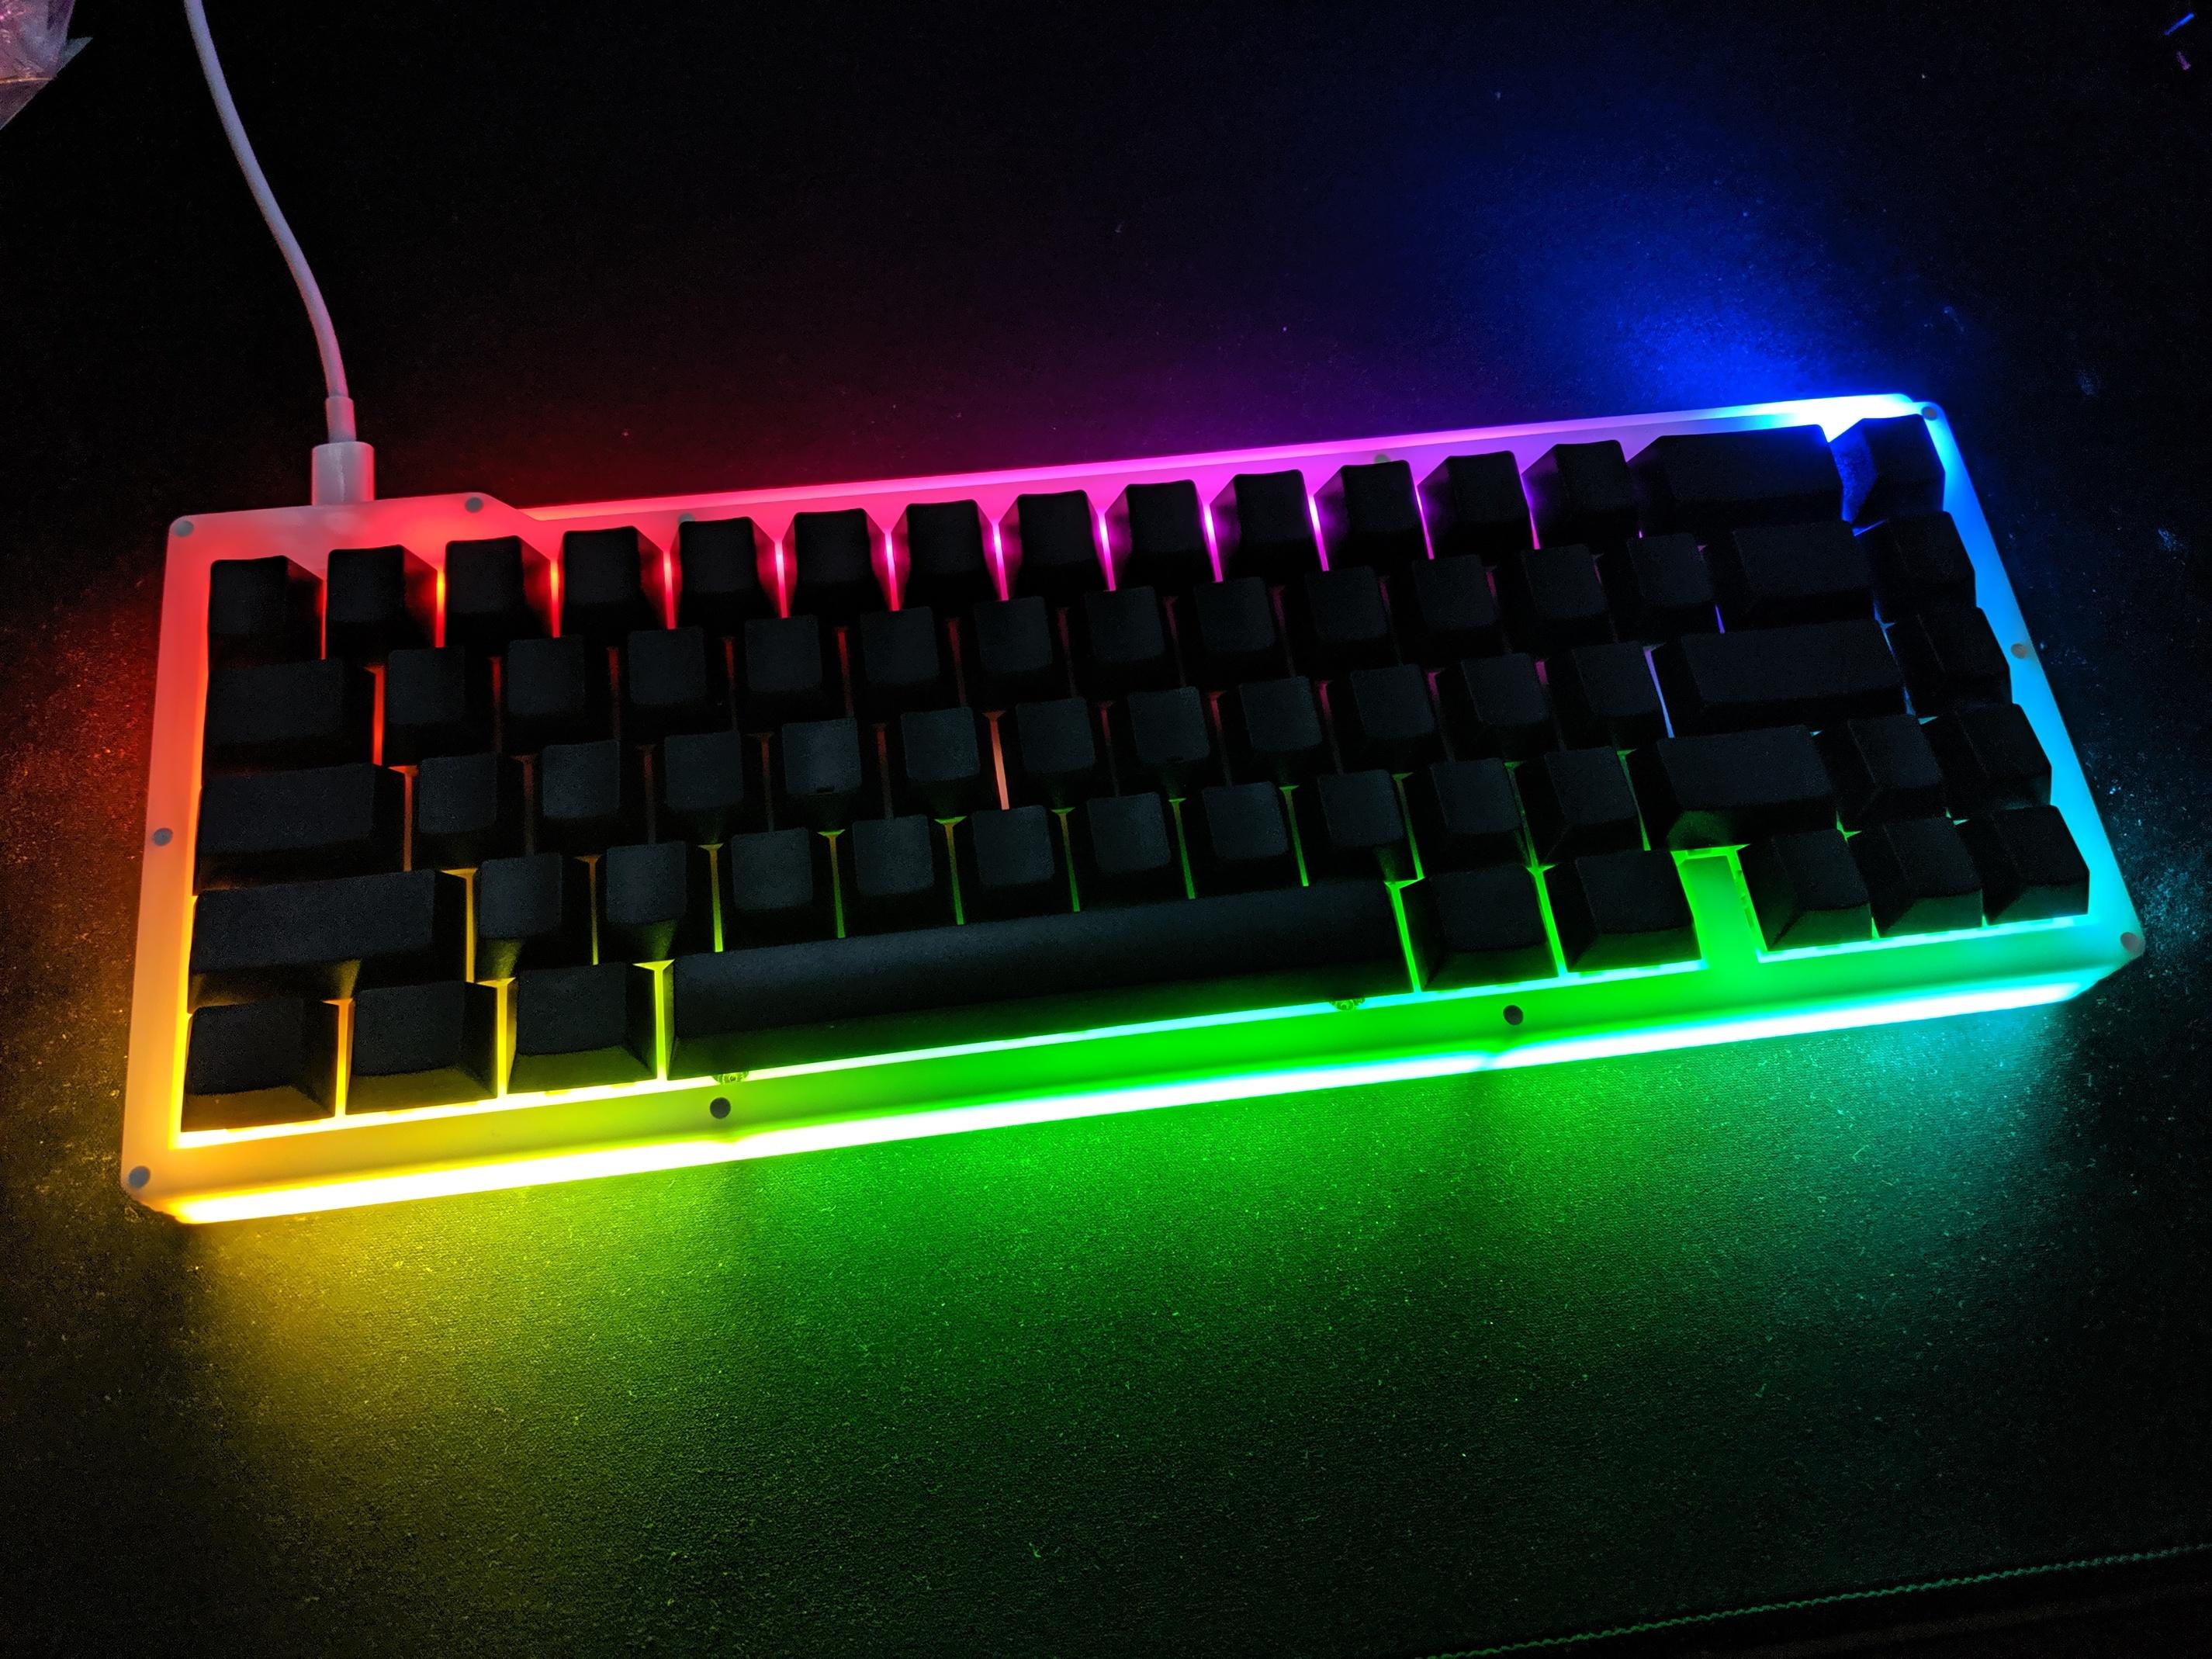 POM Kayak typing test and build info - Custom keyboards